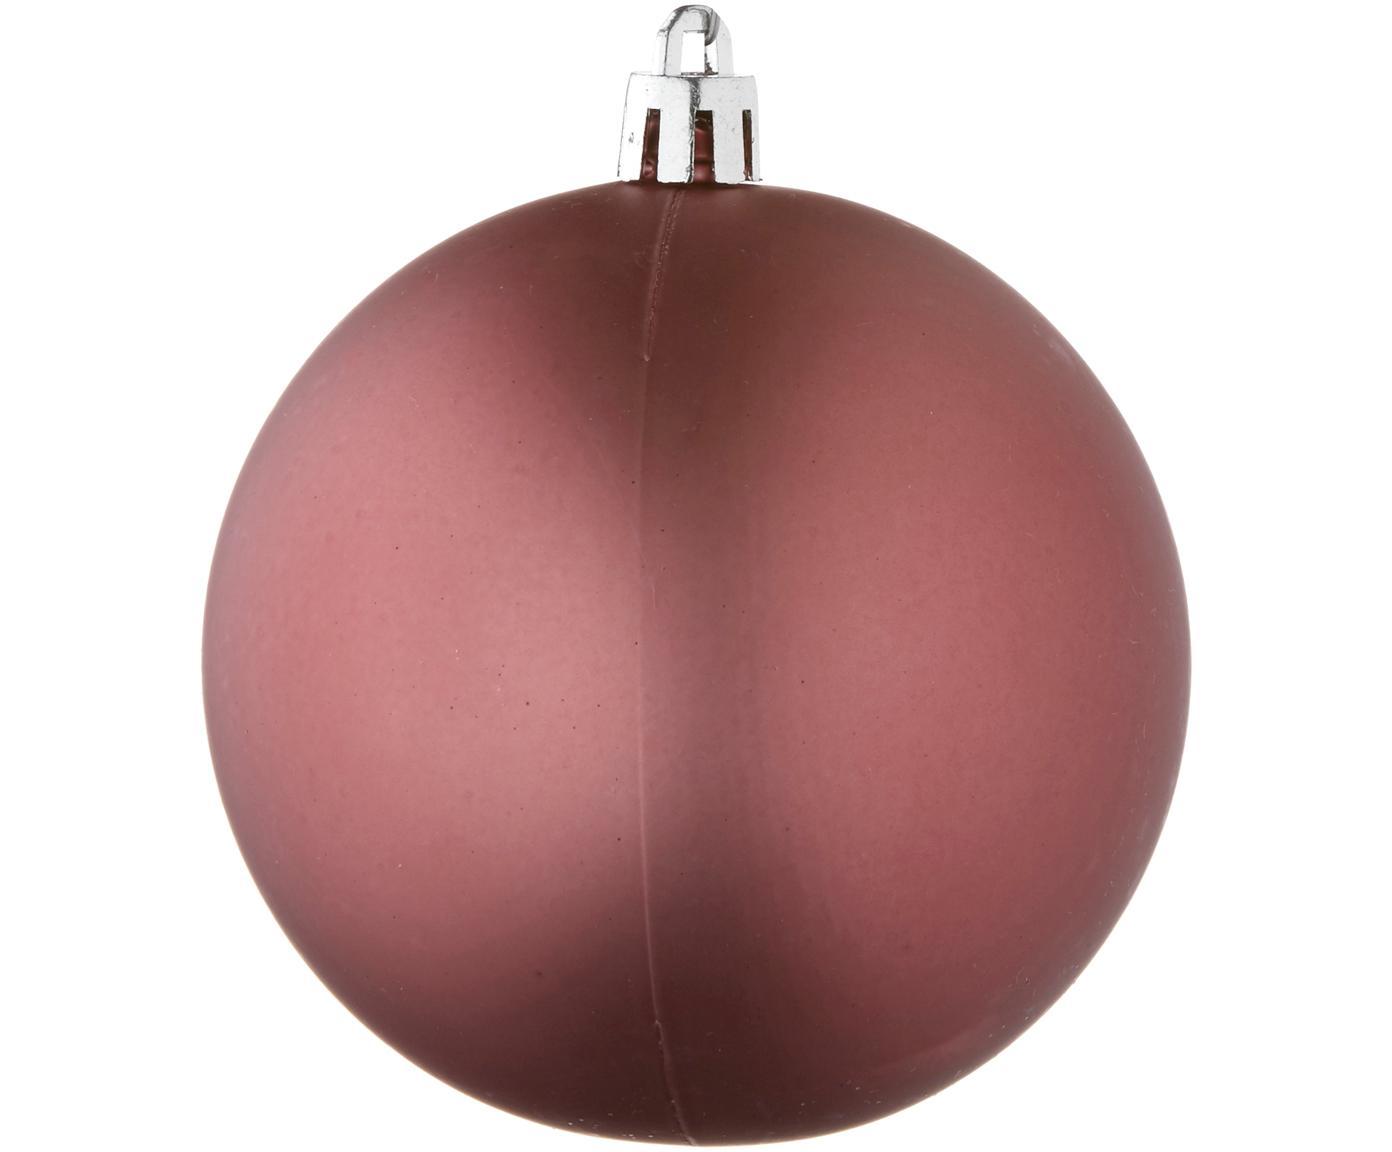 Weihnachtskugel-Set Natalie, 46-tlg., Kunststoff, Dunkelrosa, Sondergrößen